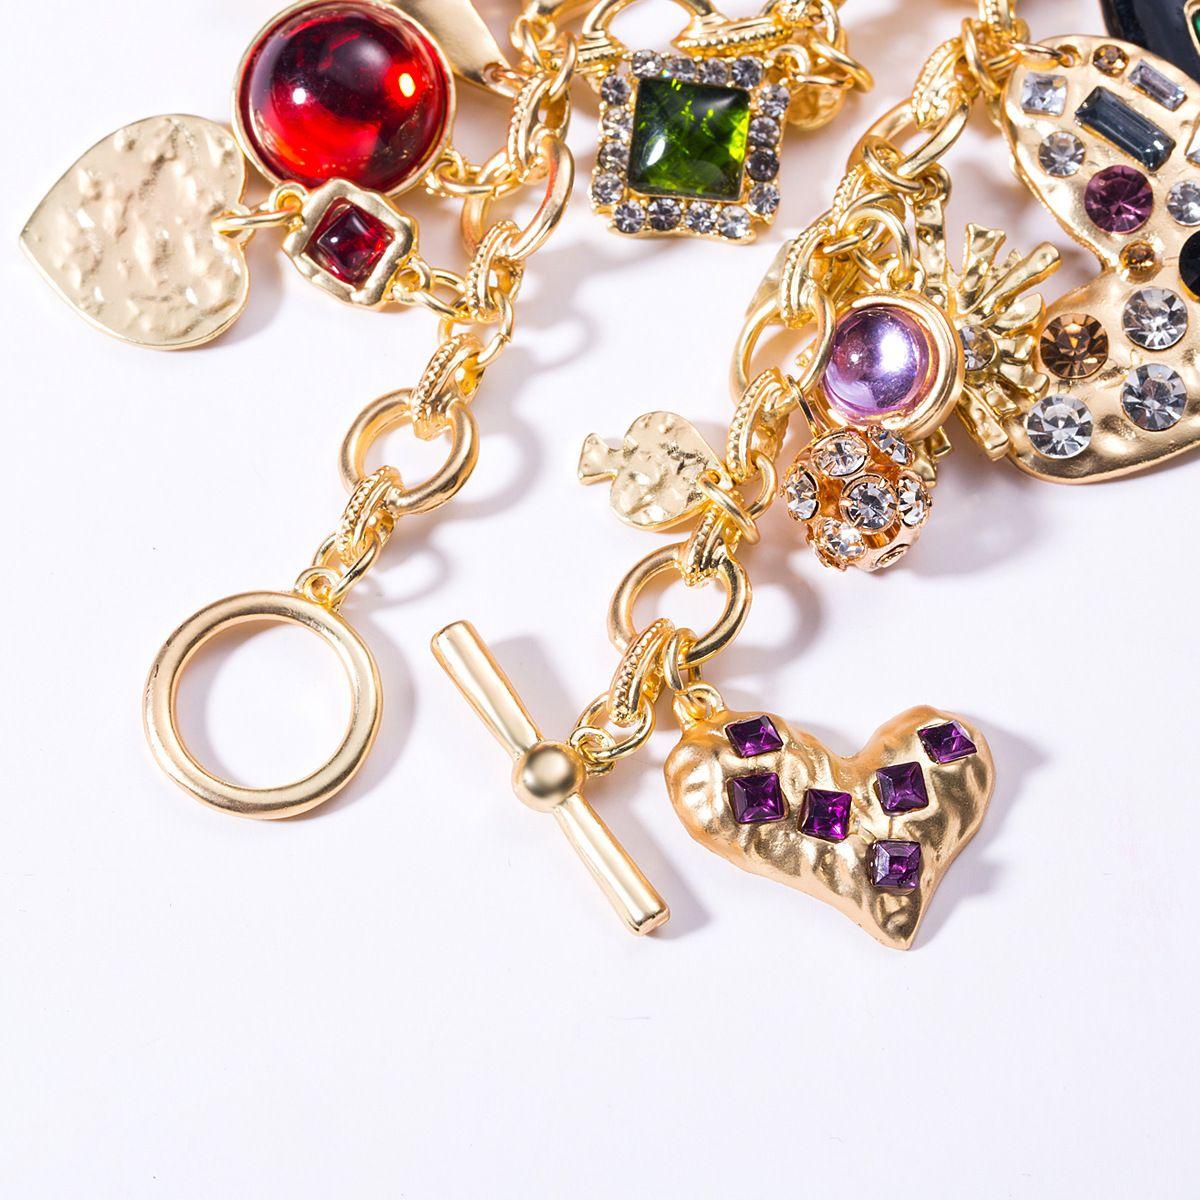 Exagerada agua femenina acrílico brazalete de diamantes pulsera de gotas de resina en forma de amor, de estilo bohemio